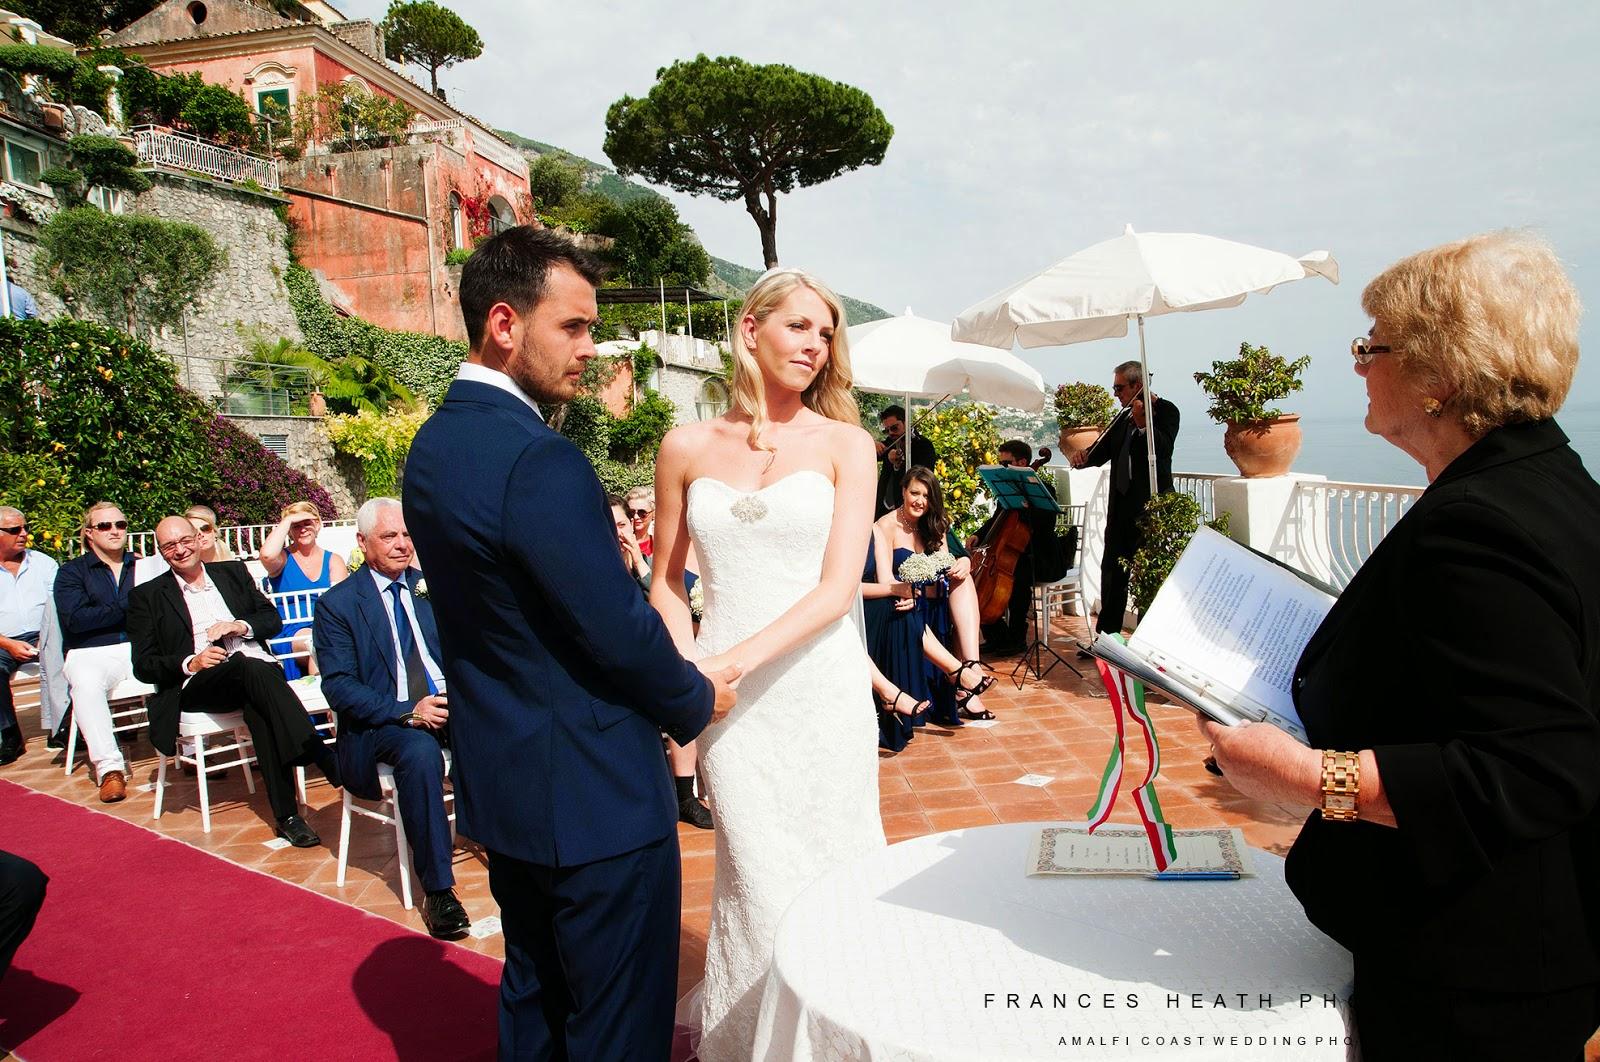 Symbolic ceremony at Hotel Marincanto in Positano